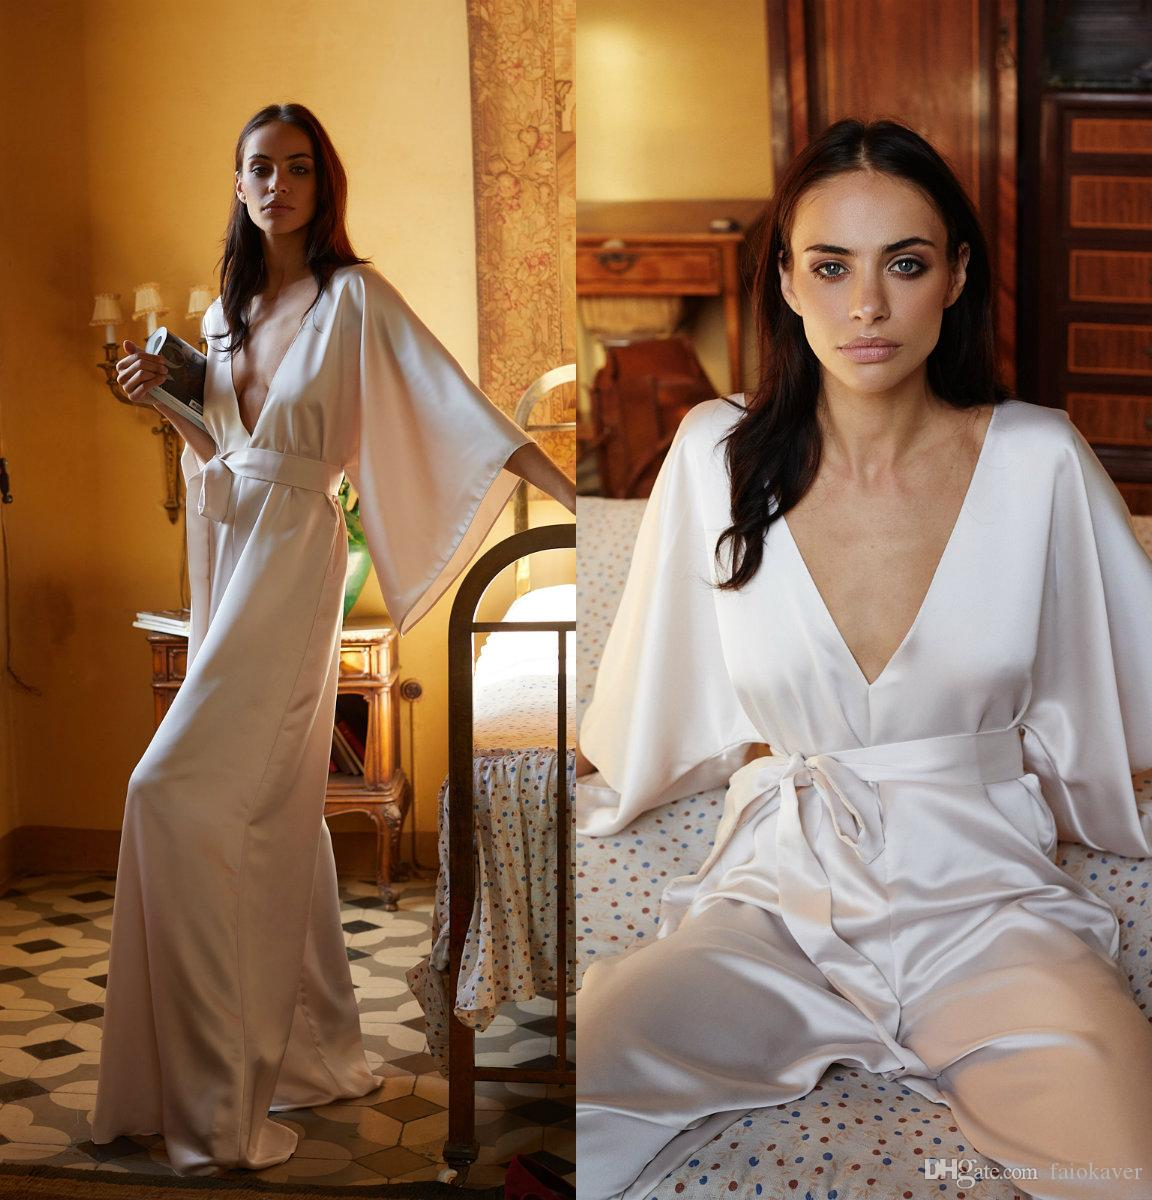 Ivory Bridal Bathrobe Jumpsuit Women Silk Satin Full Length Lingerie Nightgown Sleepwear Female Luxury Dresses Homewear Nightwear